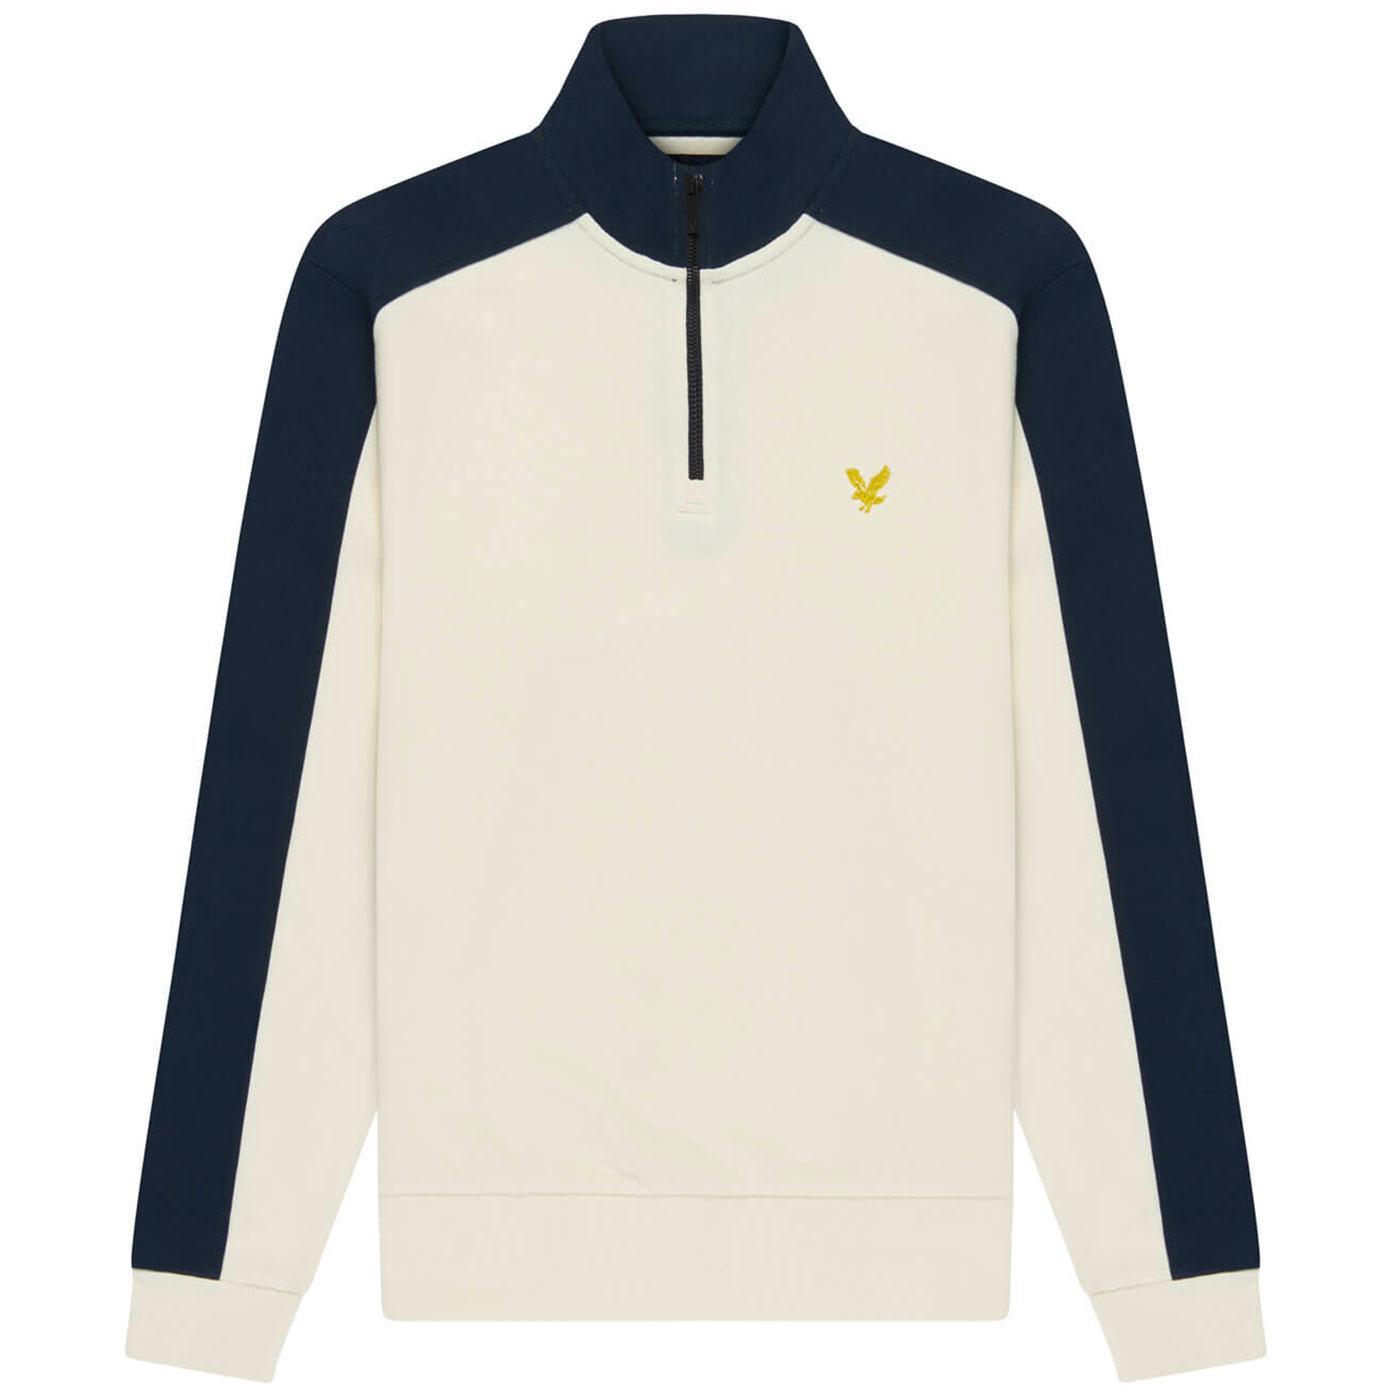 LYLE & SCOTT Archive Zip Funnel Neck Sweatshirt